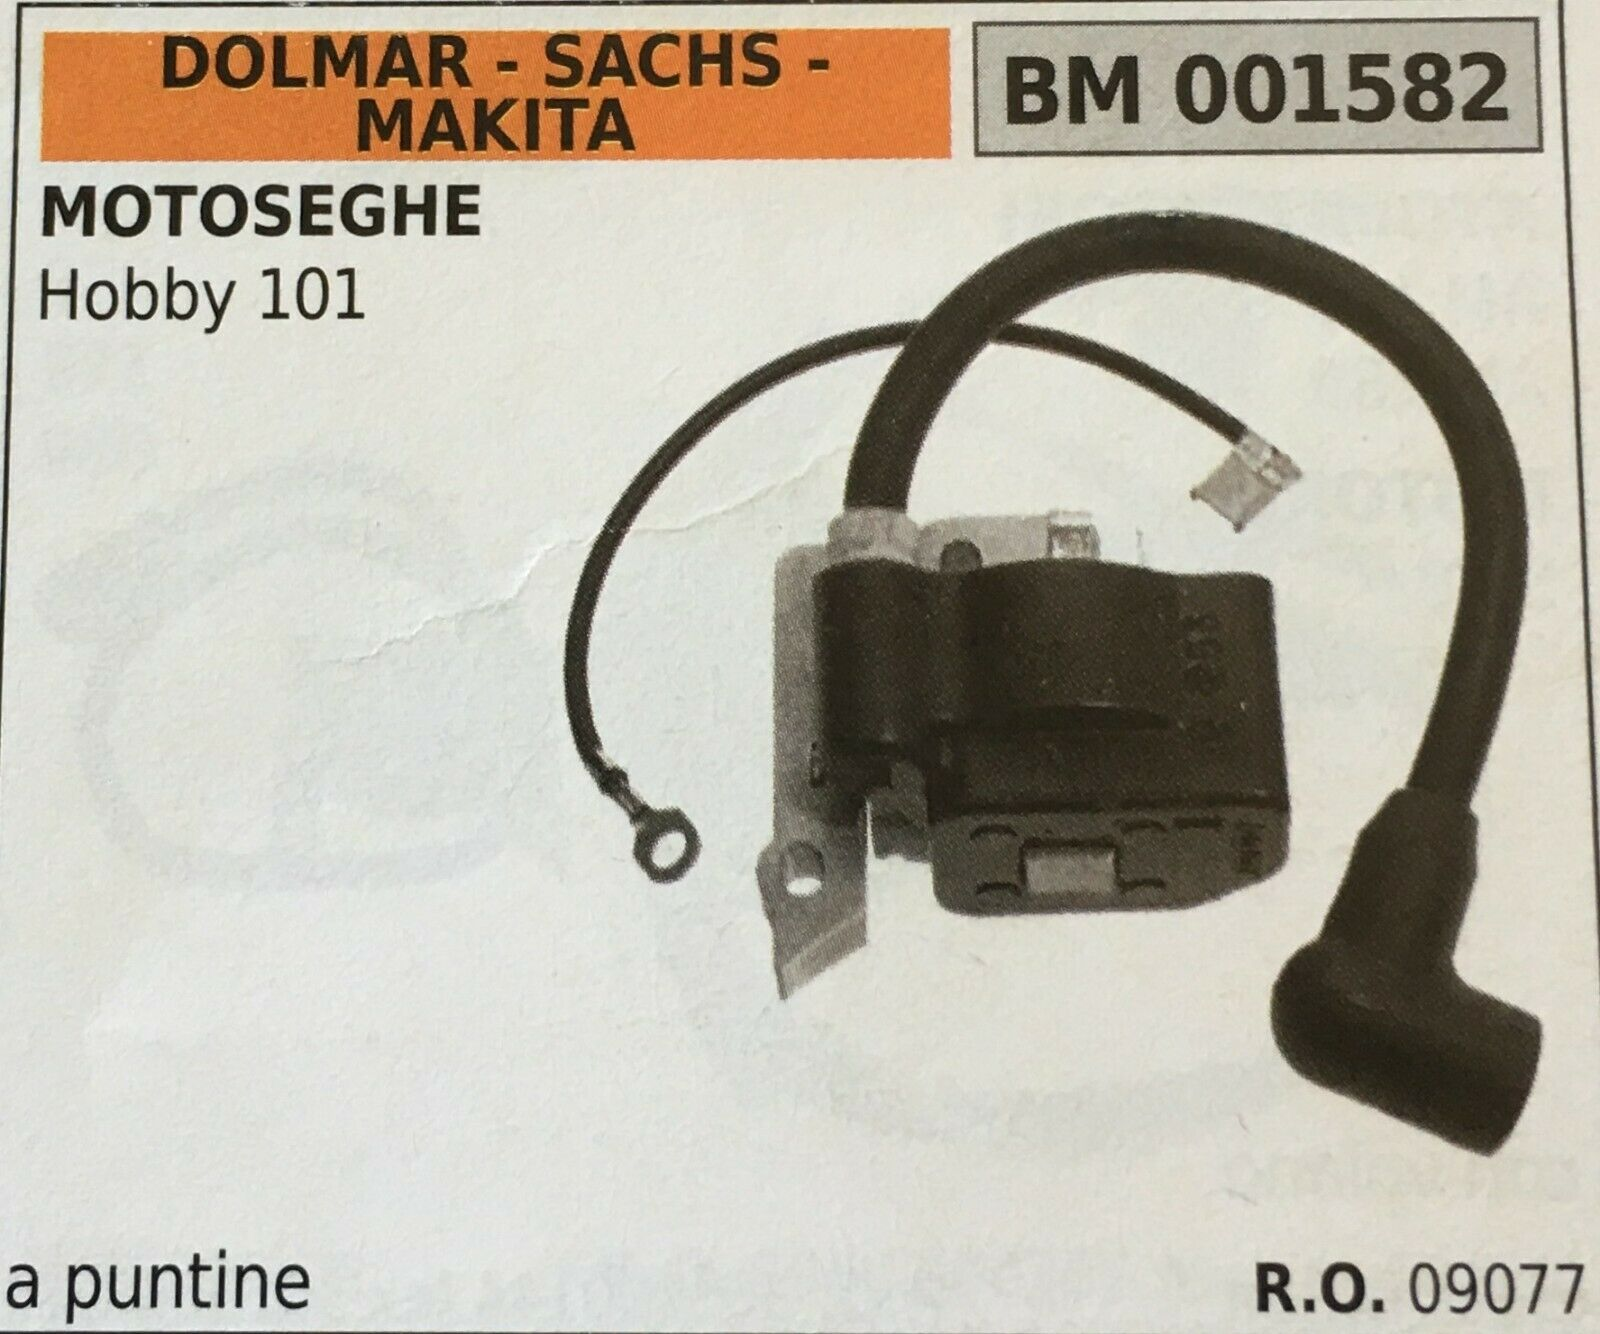 Bobina de Agujas Dolmar - Sachs - Makita Bm 001582